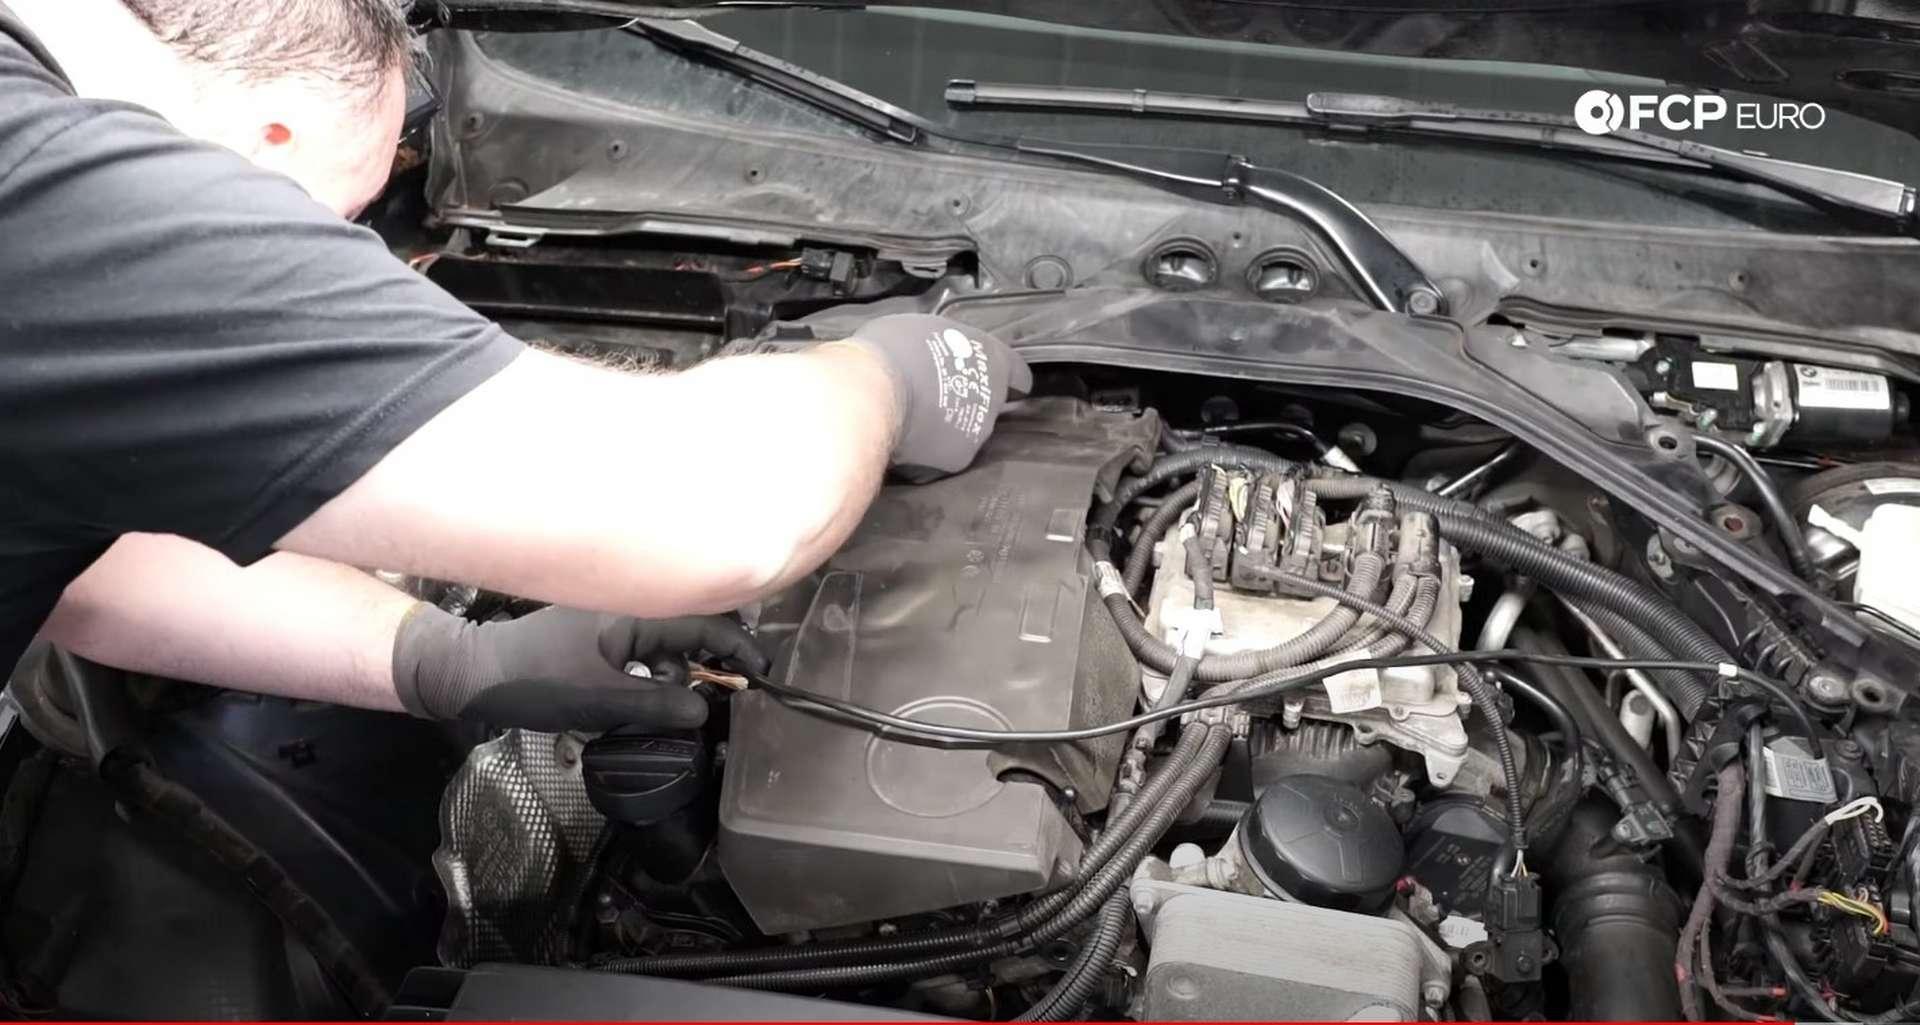 28-DIY-BMW-F30-Fuel-Injector-Replacement_Refitting-Plastics